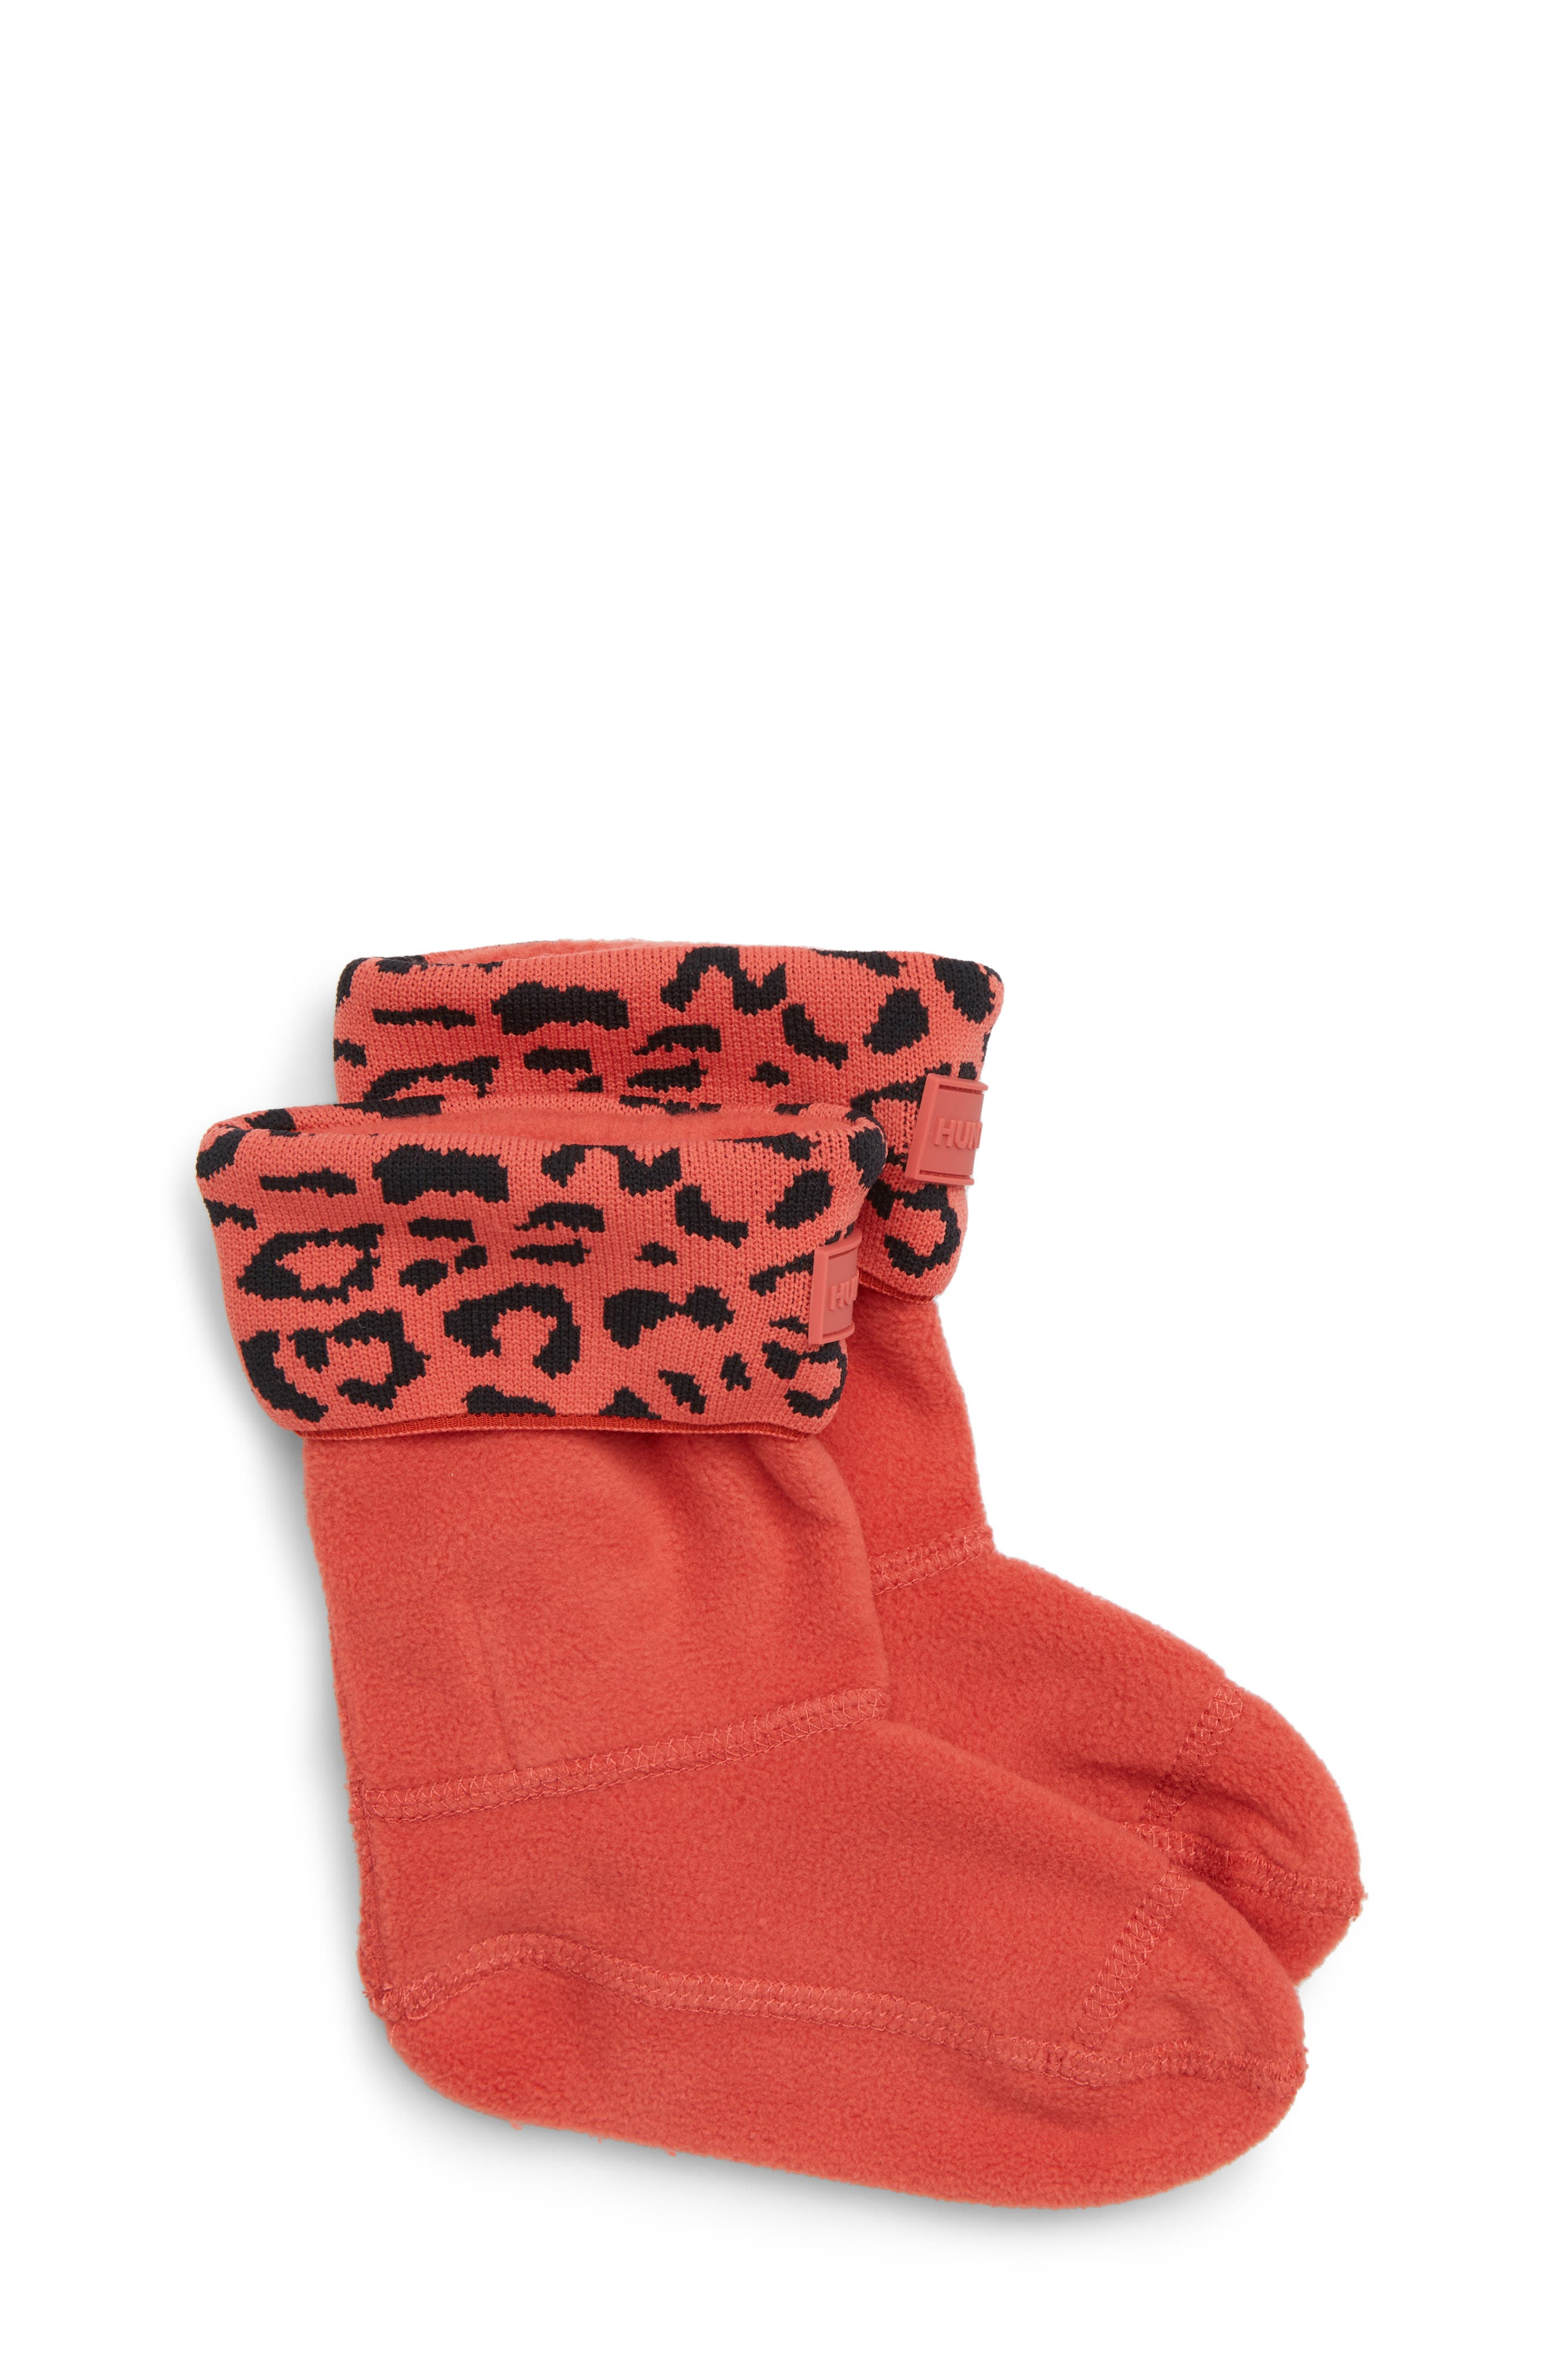 Snow Leopard Cuffed Boot Socks,                         Main,                         color, HONEYSUCKLE LEOPARD JACQUARD